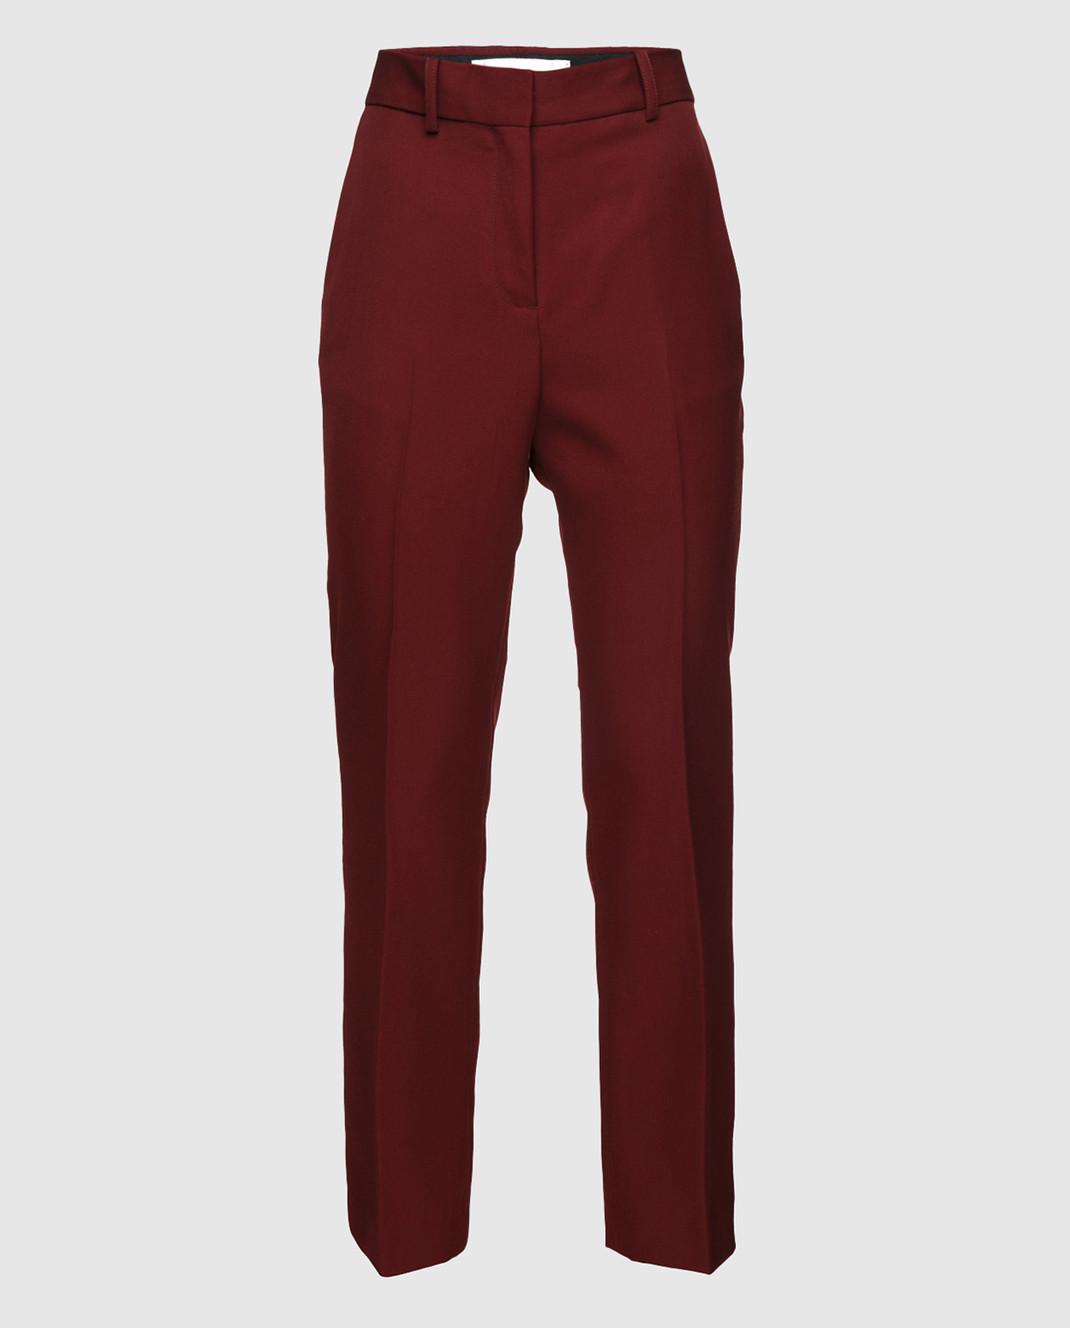 Victoria by Victoria Beckham Бордовые брюки из шерсти TRVV085B